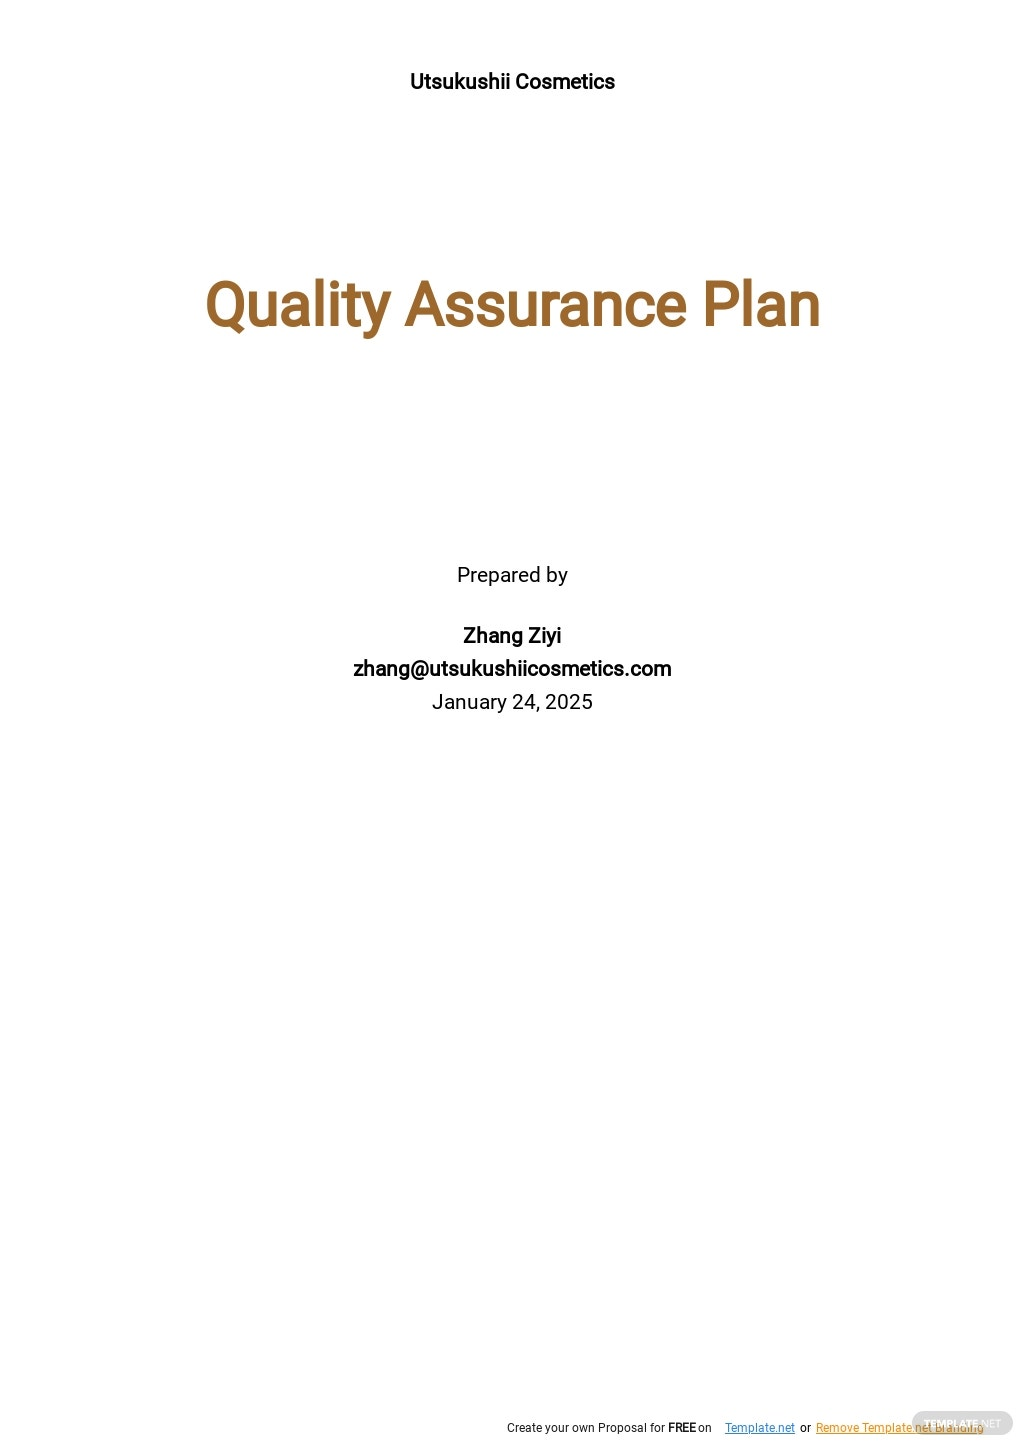 Sample Quality Assurance Plan Template.jpe